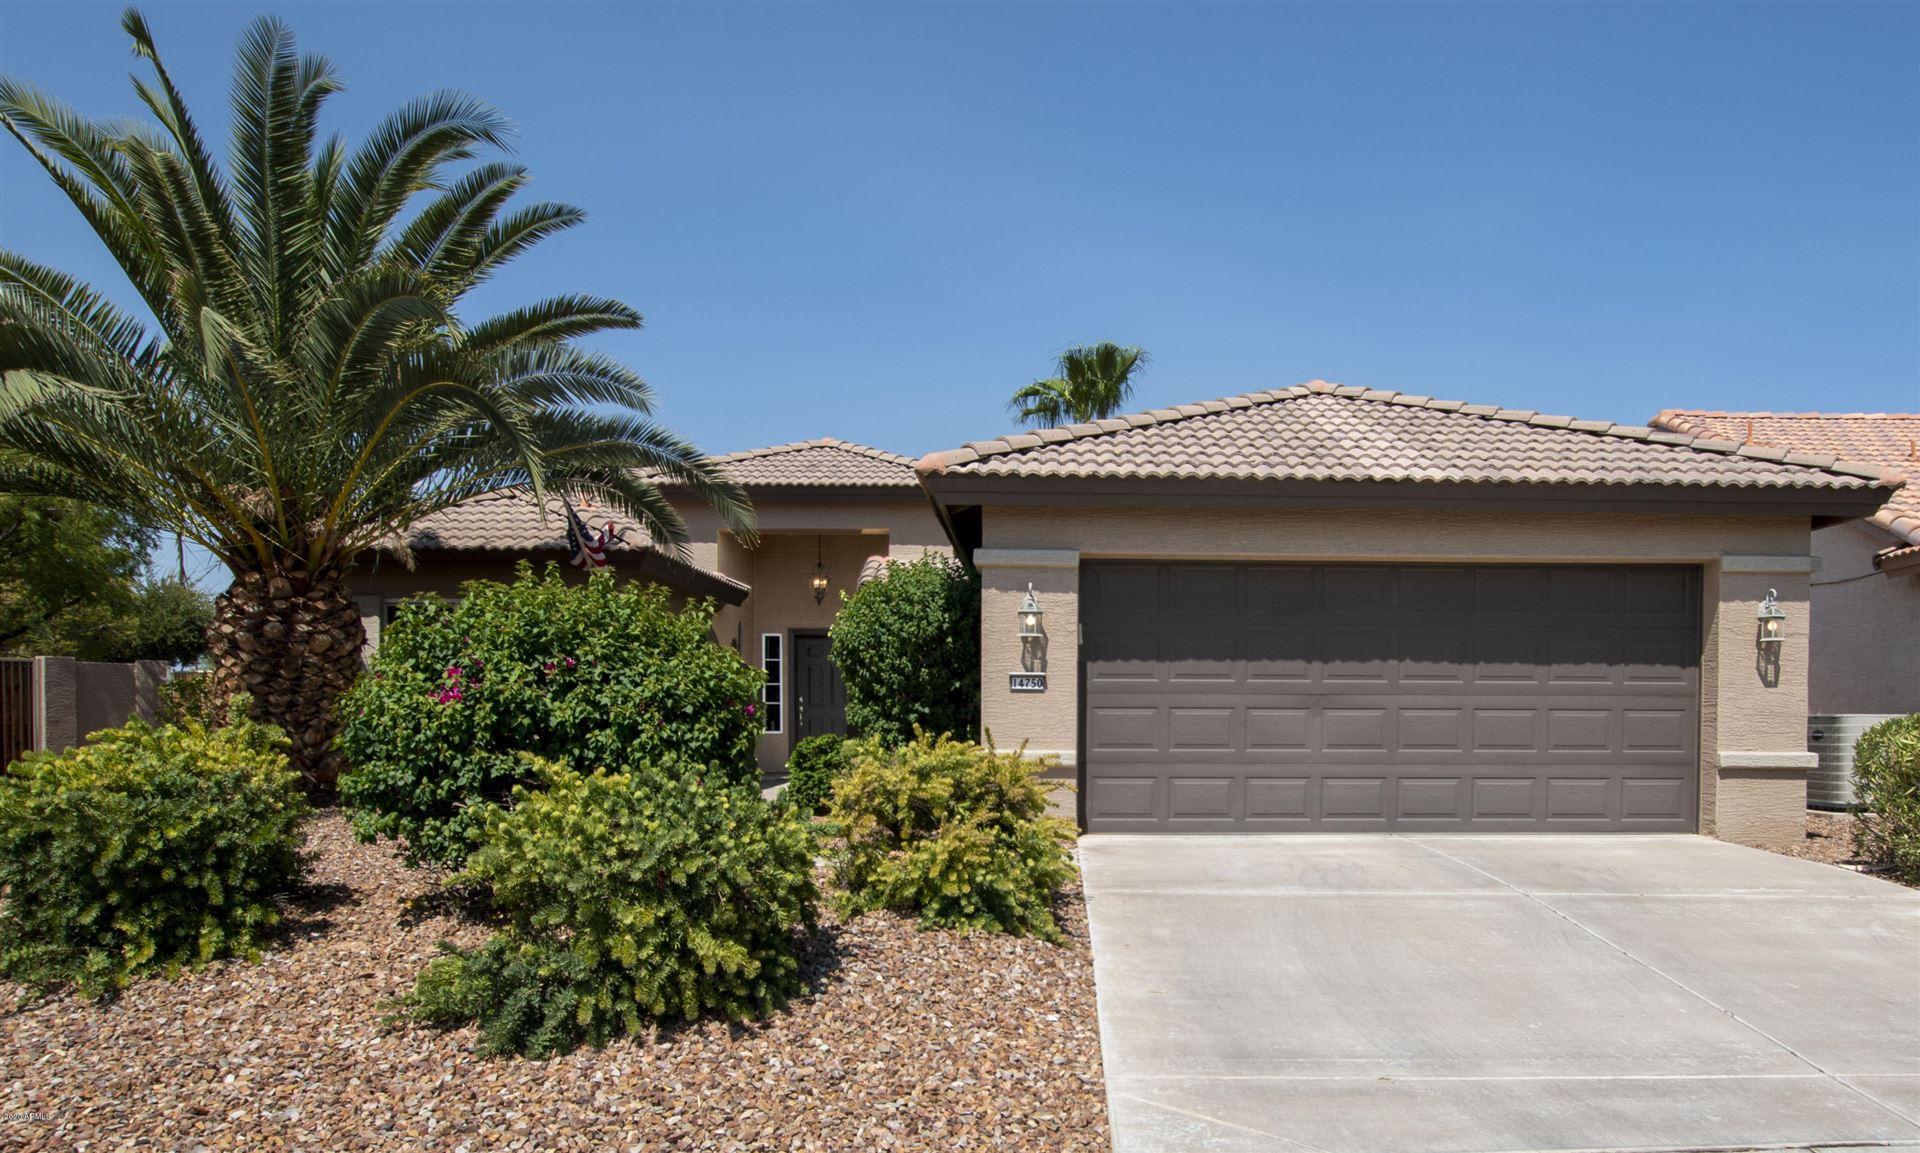 14750 W AVALON Drive, Goodyear, AZ 85395 - MLS#: 6128286